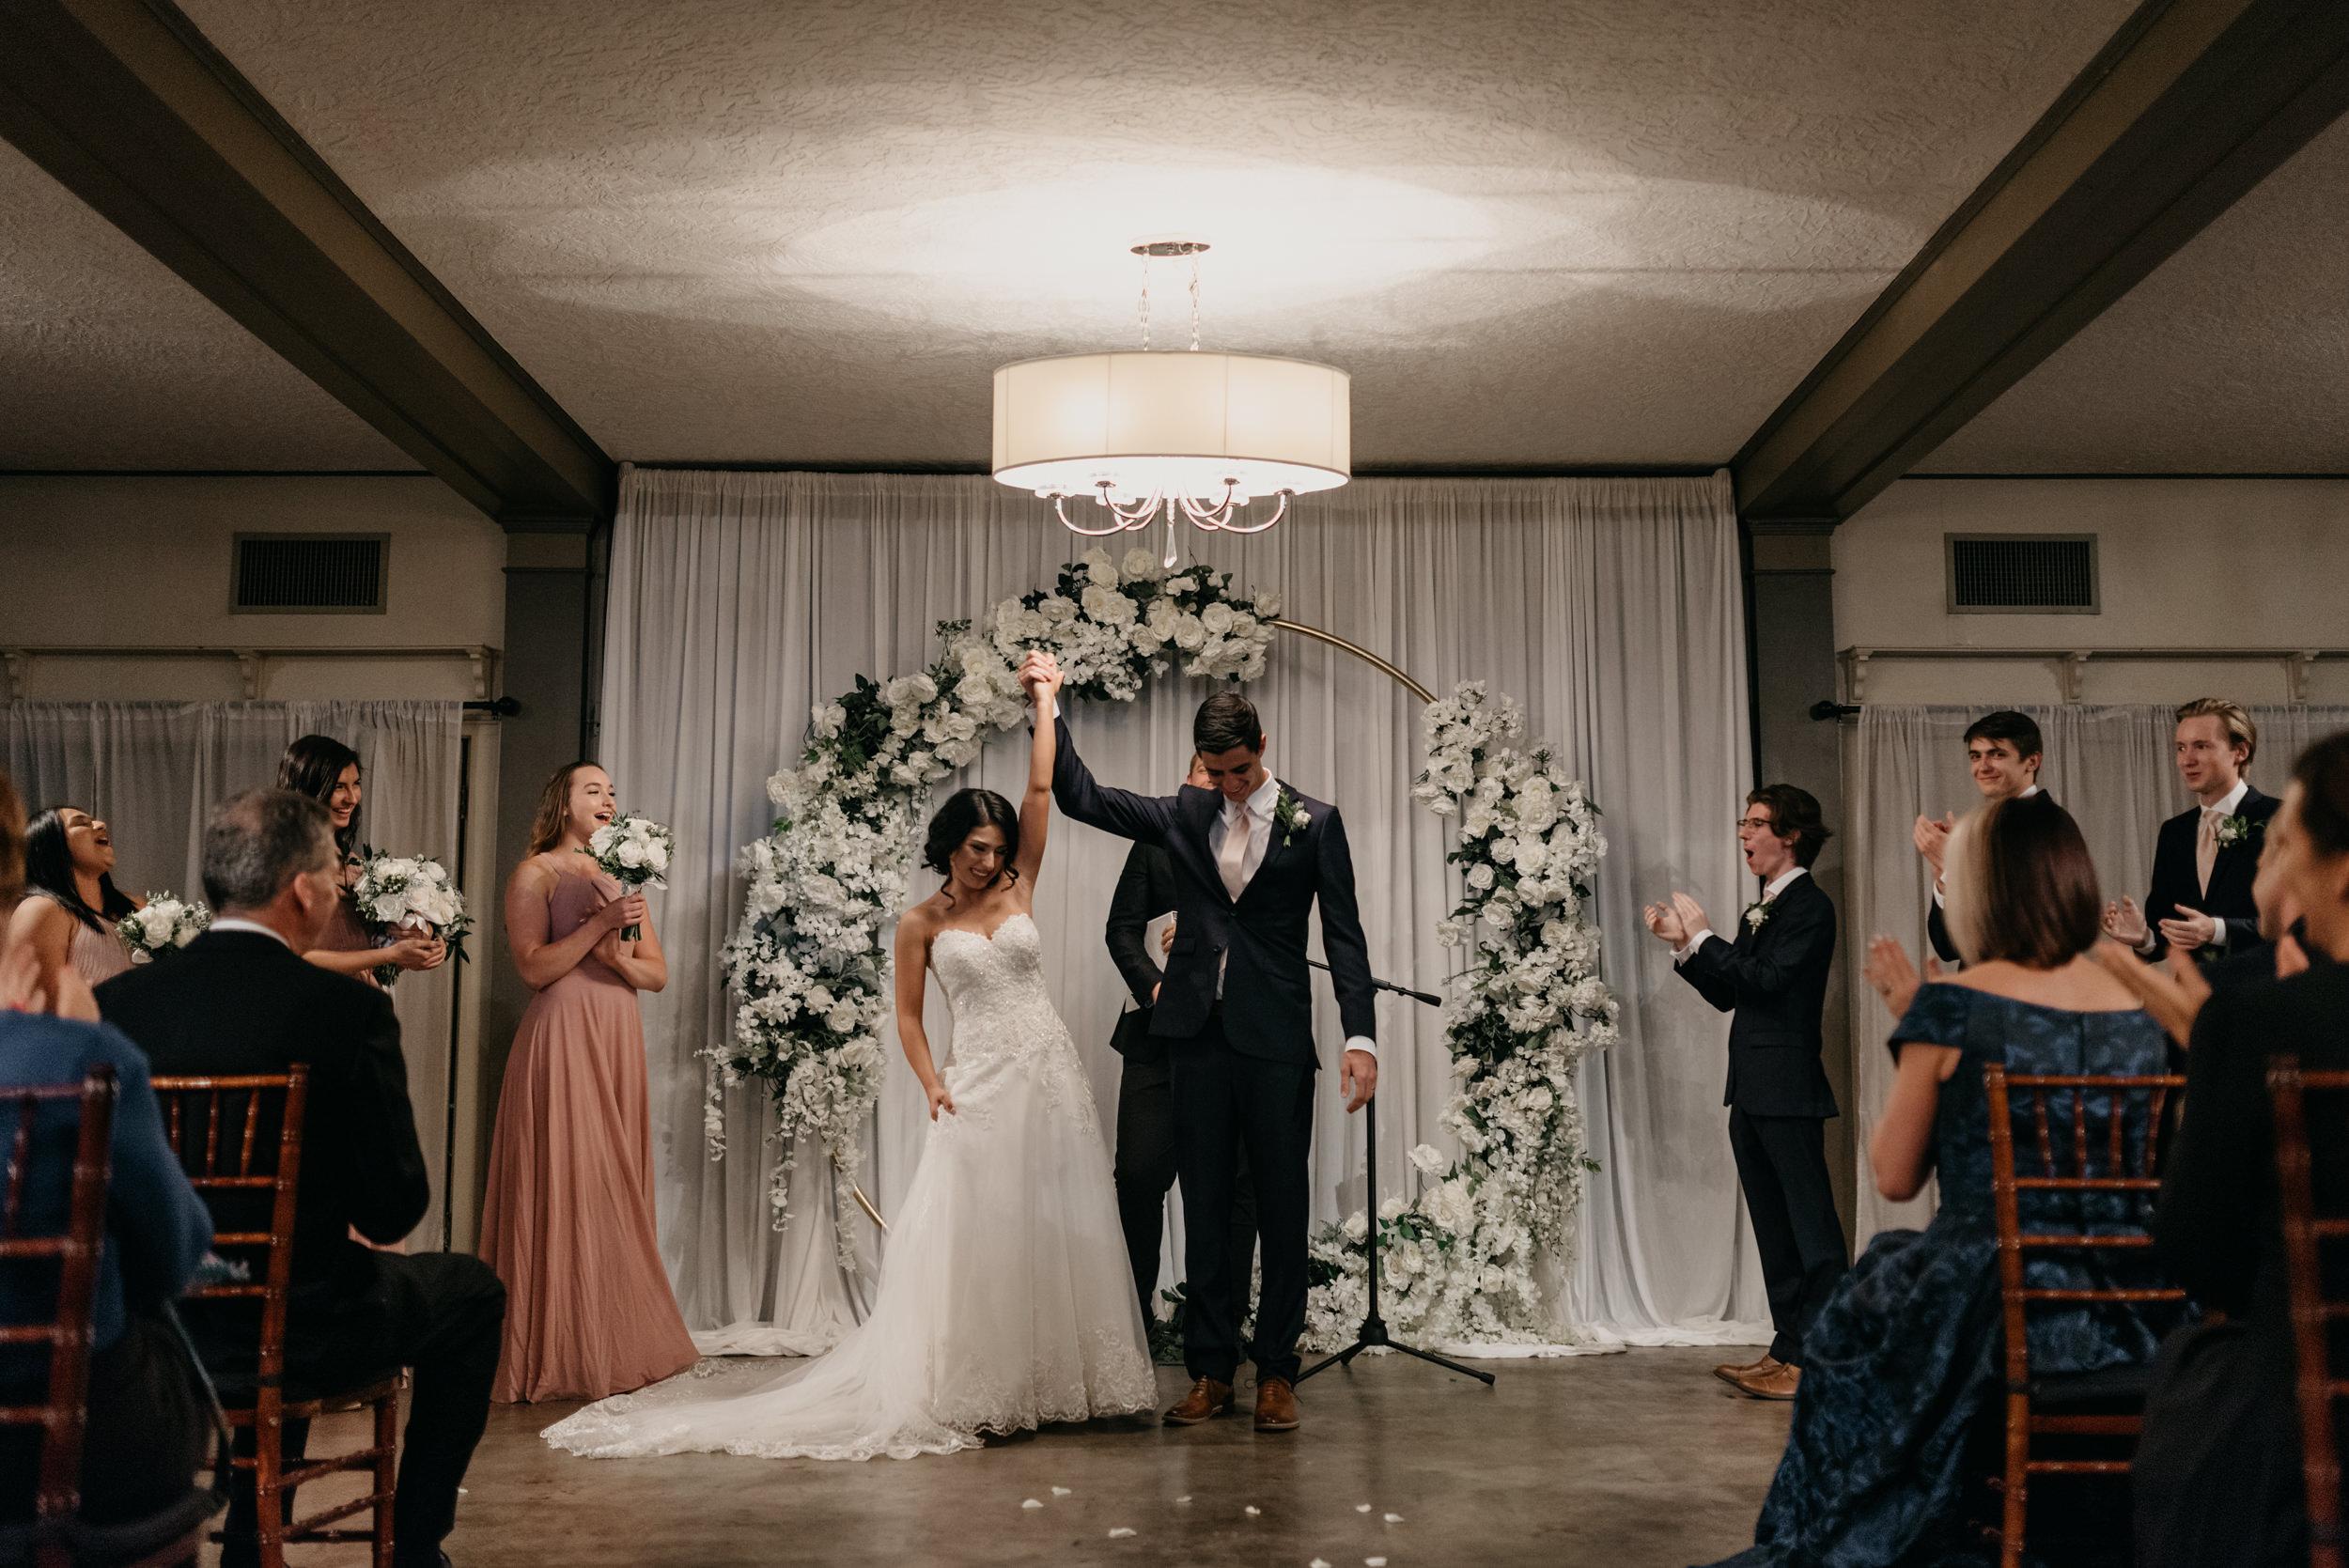 98-ceremony-west-end-ballroom-portland-wedding-venue-8052.jpg